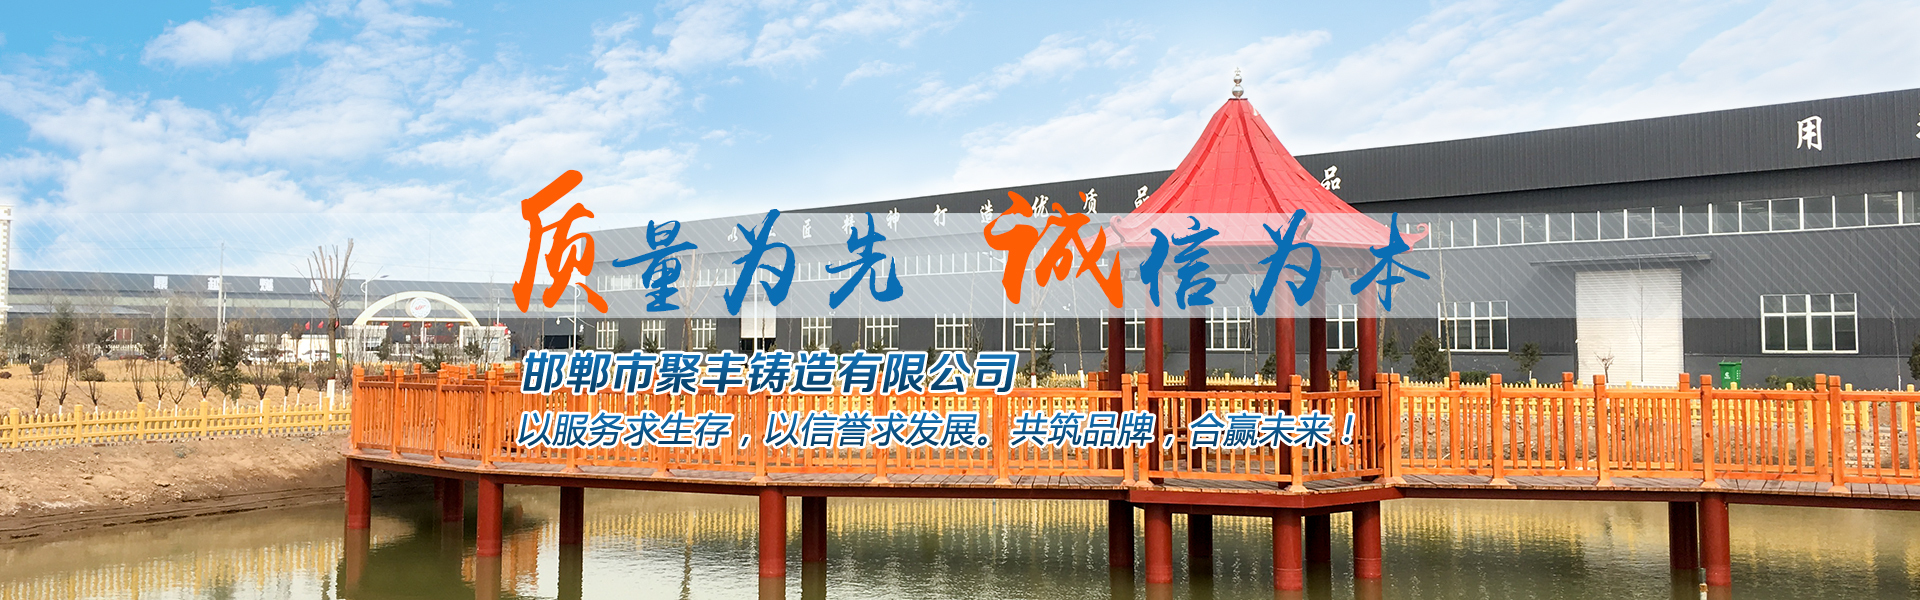 368271.com澳门太阳城